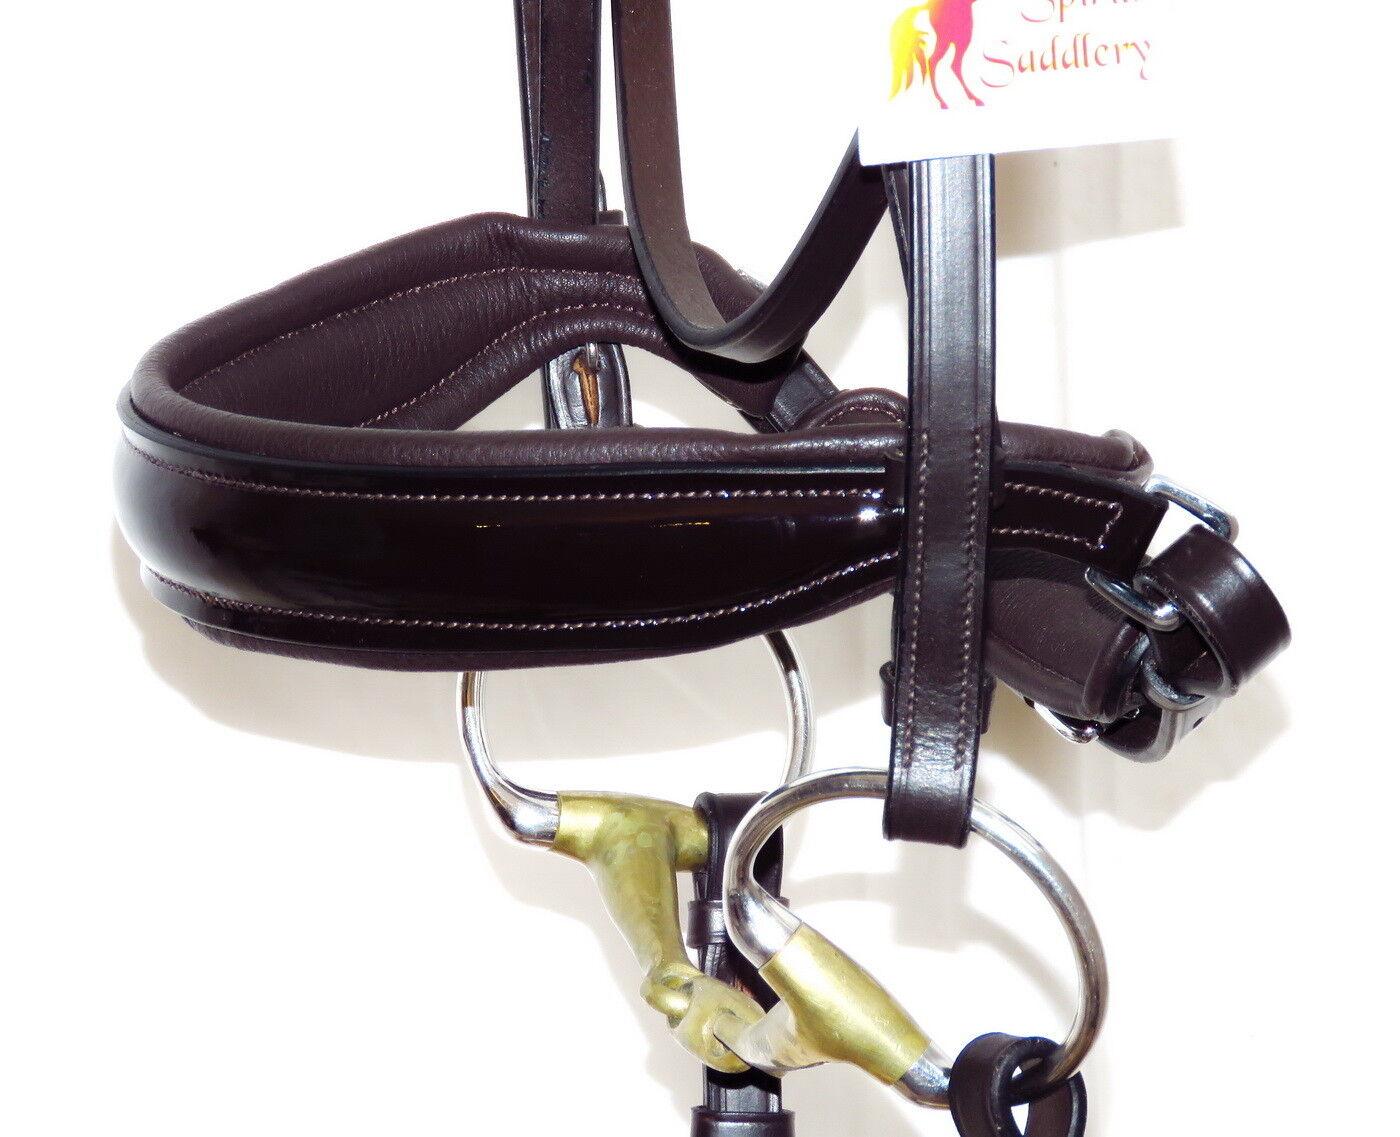 FSS FREEFORM Comfort Anatomic CUT AWAY Headpiece CAVESSON Noseband PATENT PATENT Noseband Bridle 9c33d5